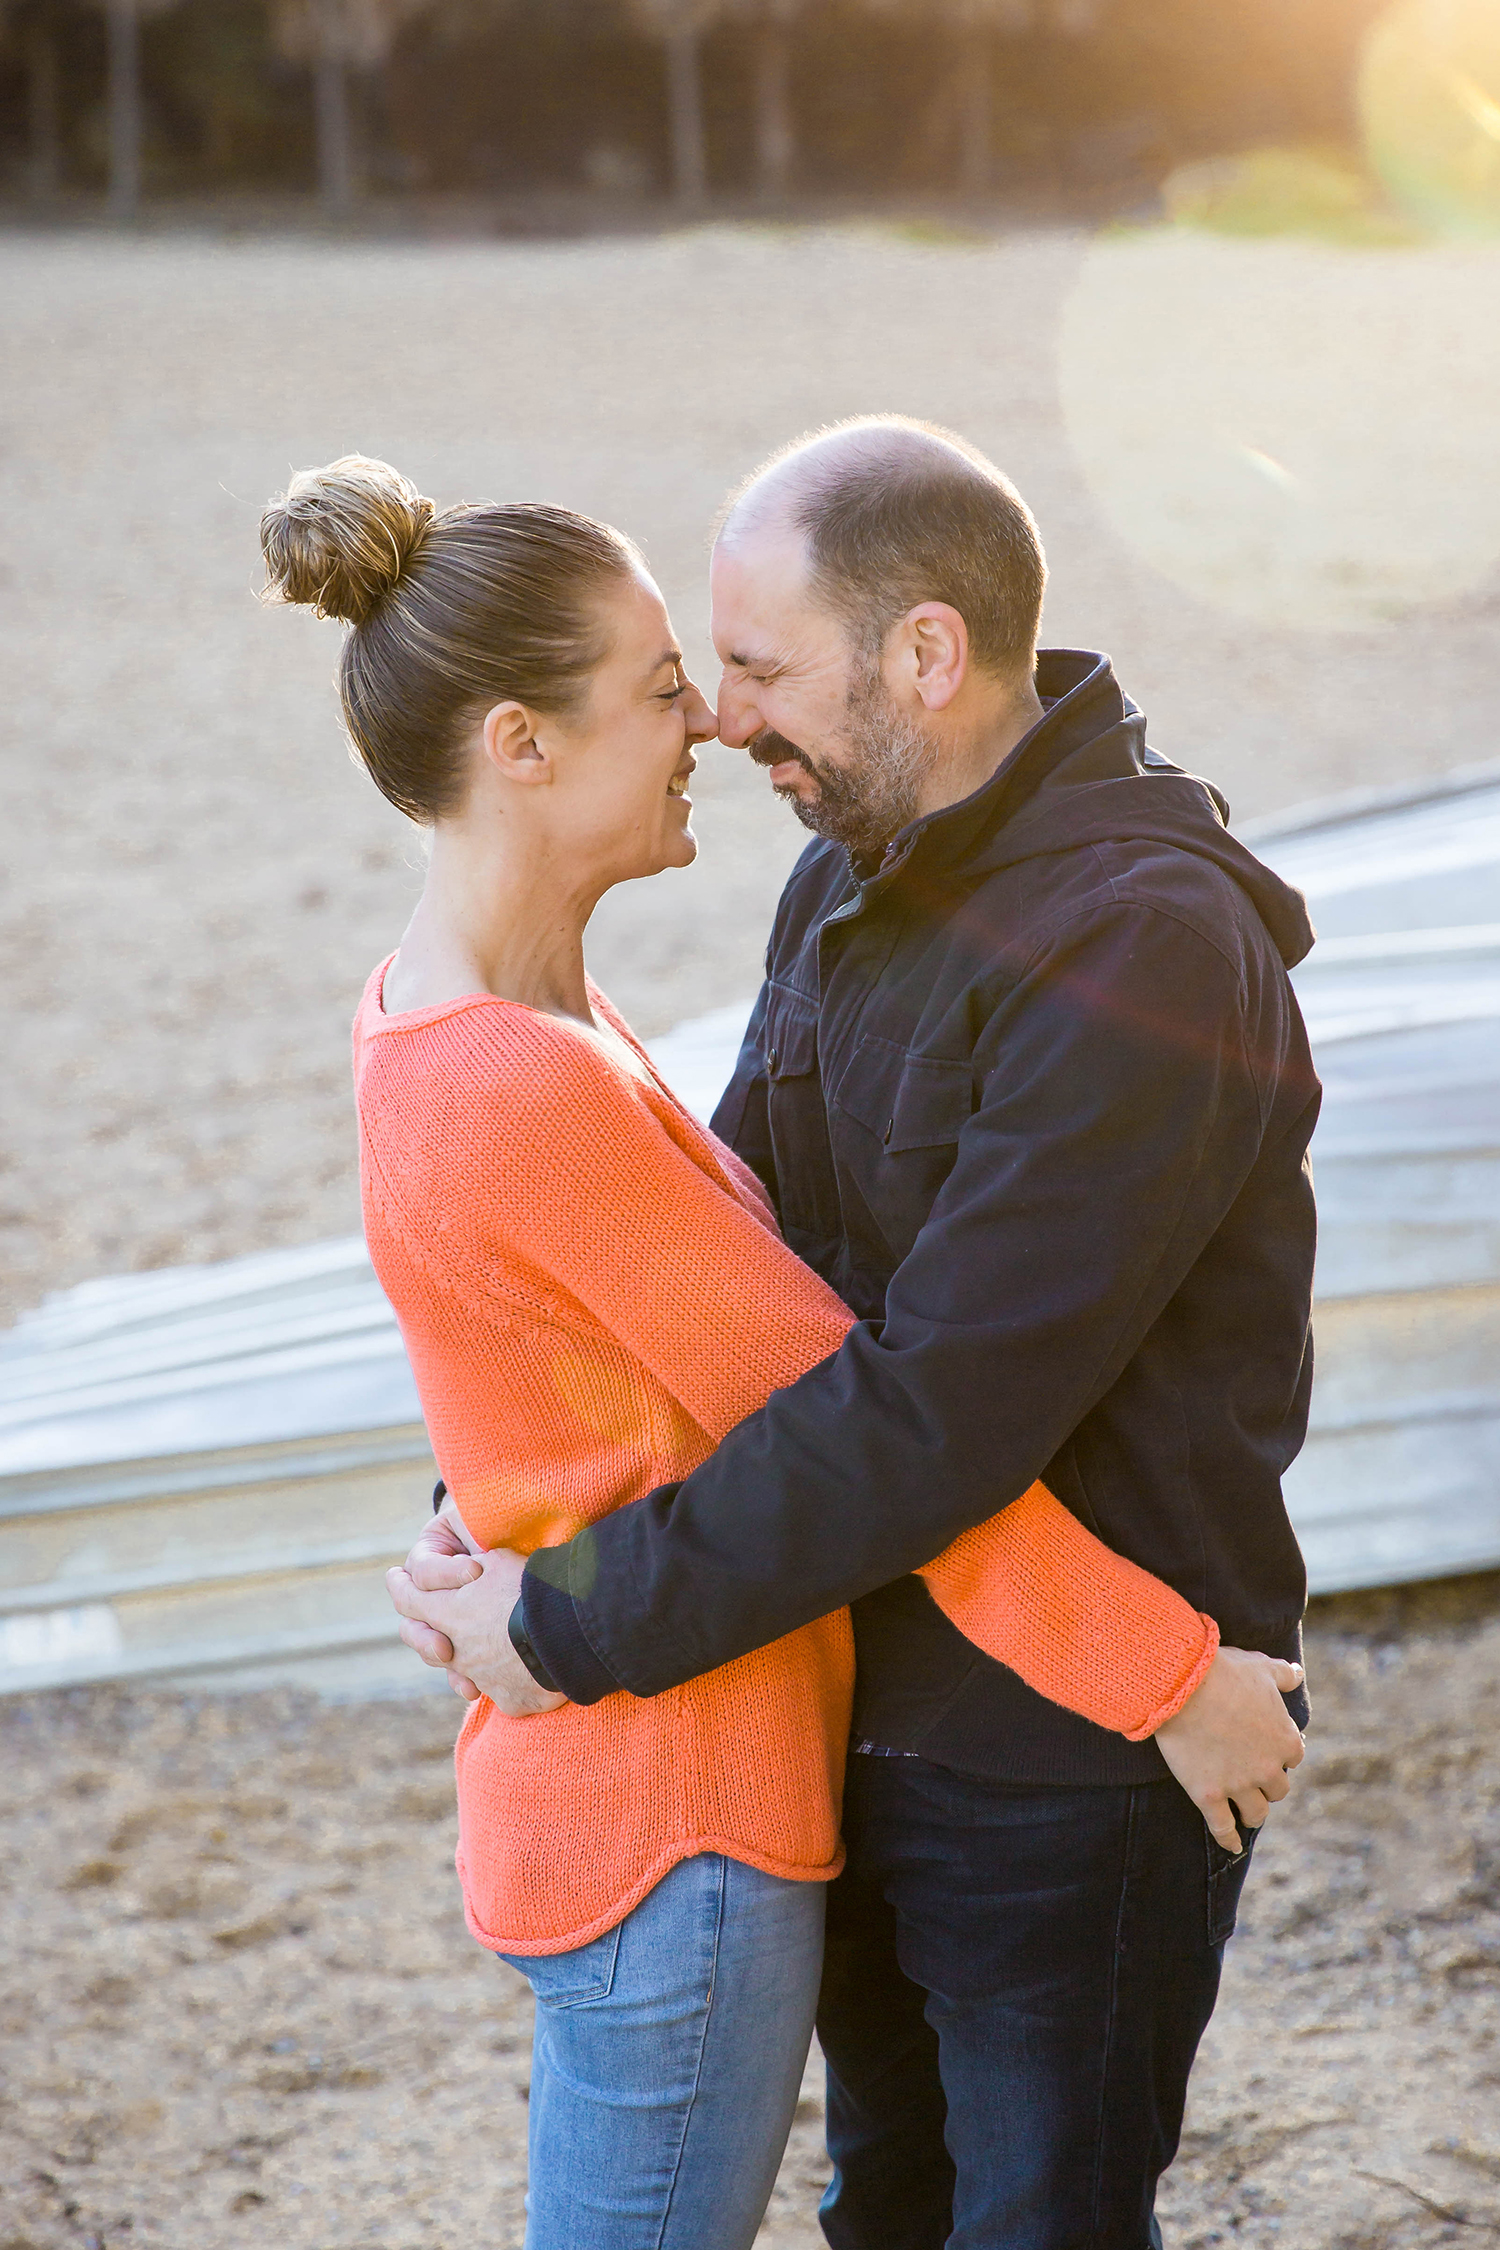 Sydney Pre-Wedding Photo Session - Shelly Beach Manly - Jennifer Lam Photography (16).jpg